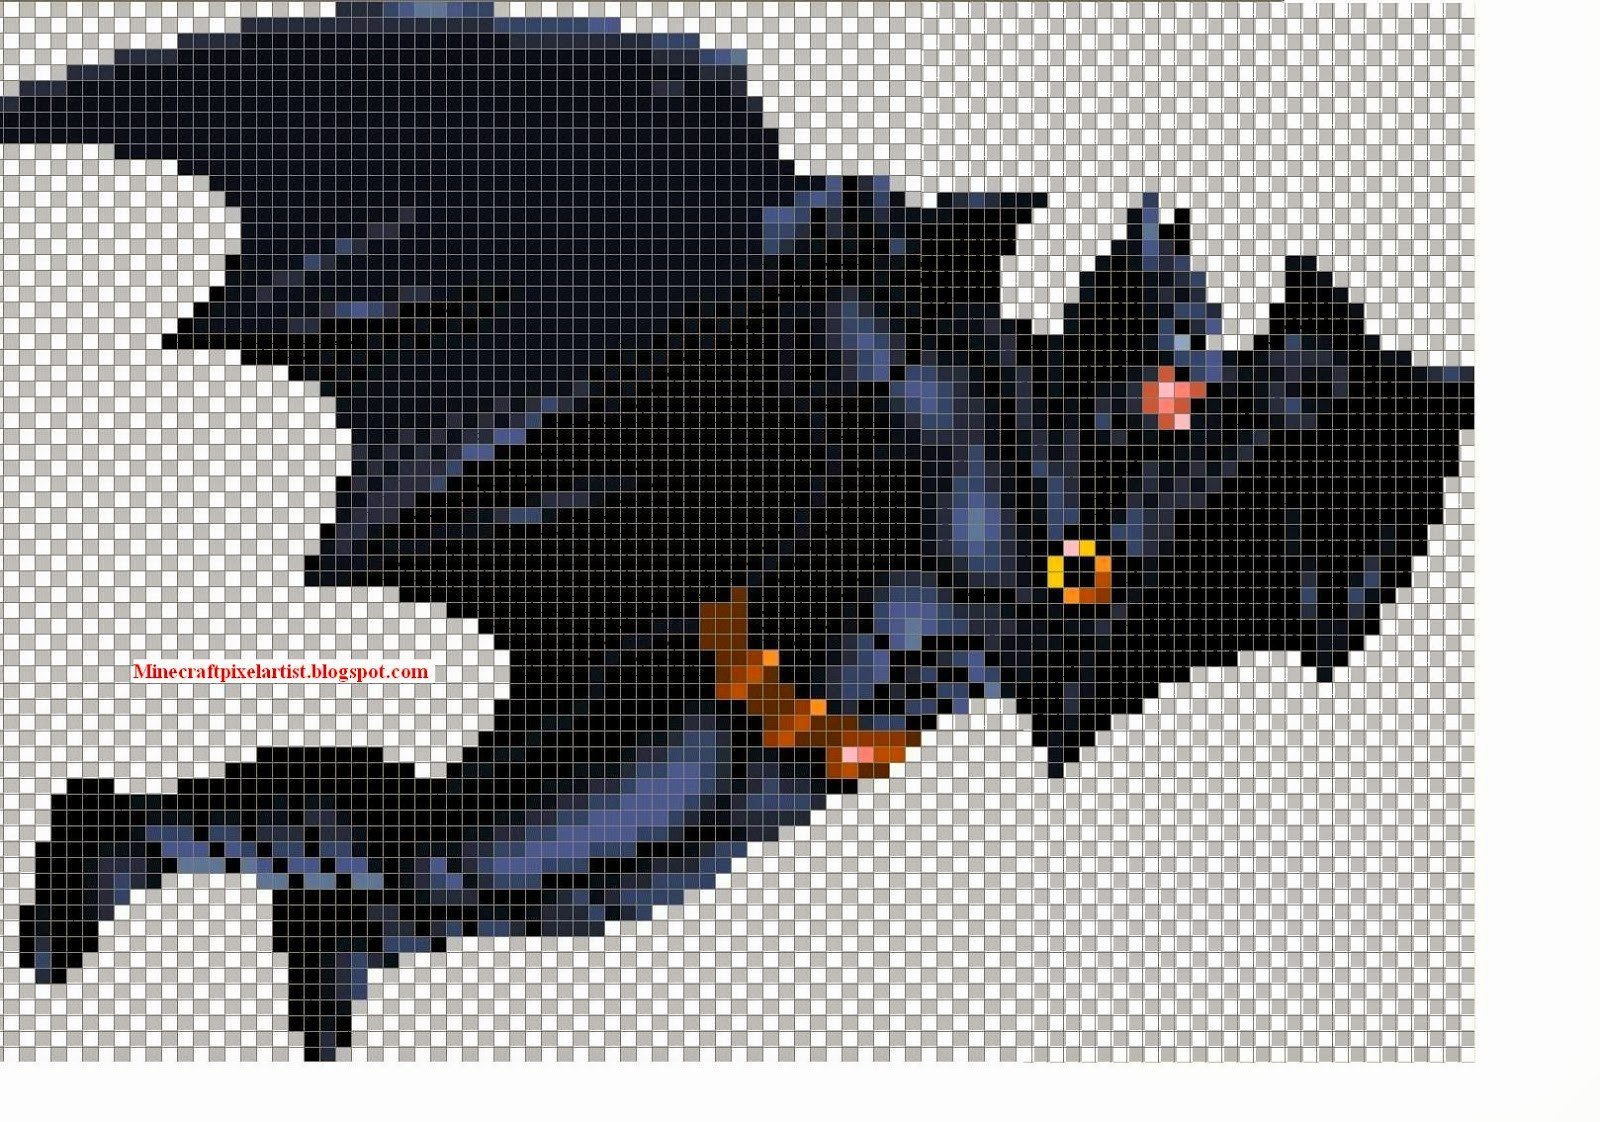 Minecraft Pixel Art Templates Minecraft Pixel Art Templates and Tutorials